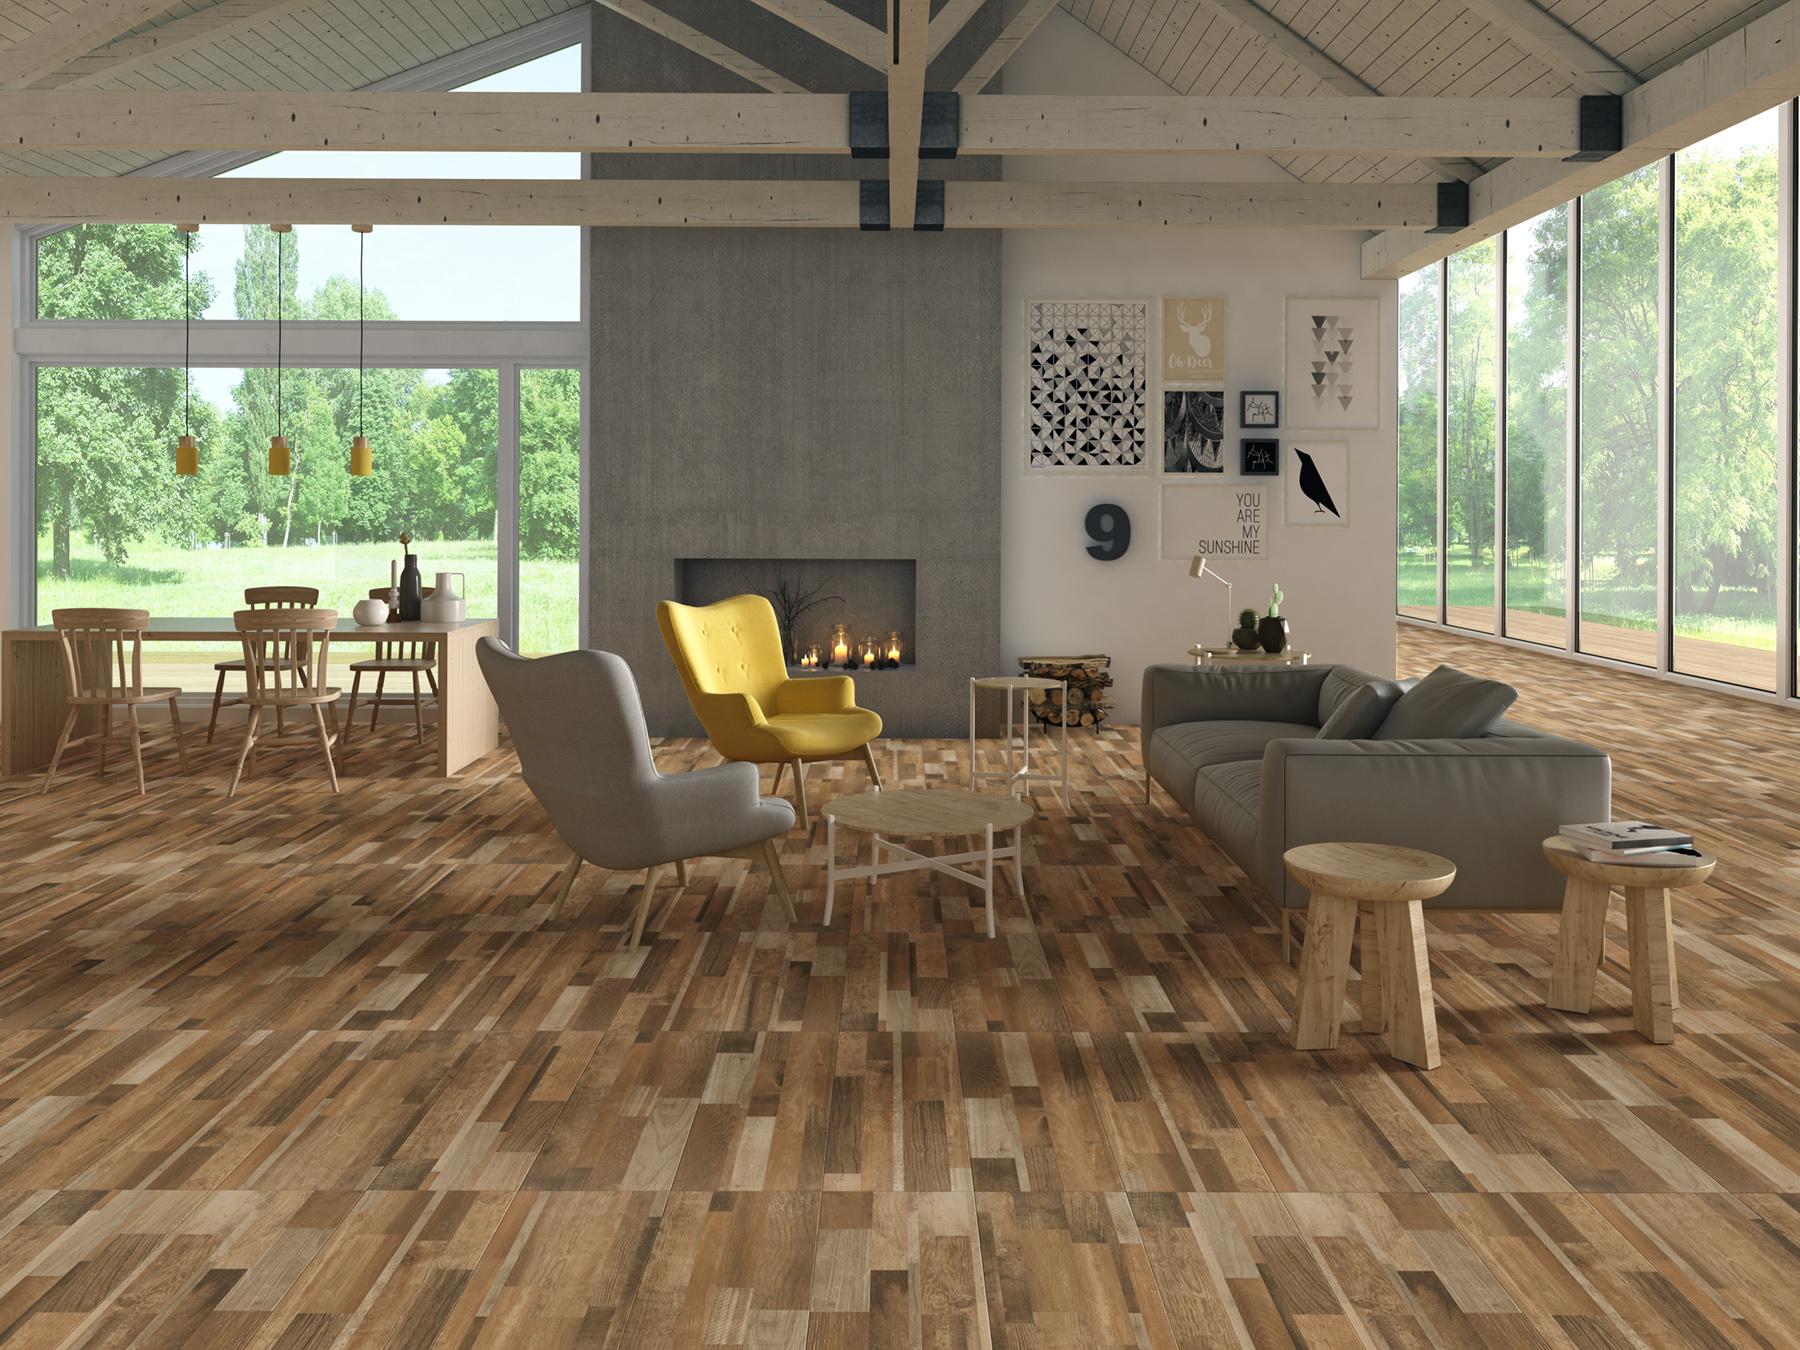 Interiorismo 3d madera sal n valencia arquitectura y 3d vale for Programas 3d interiorismo